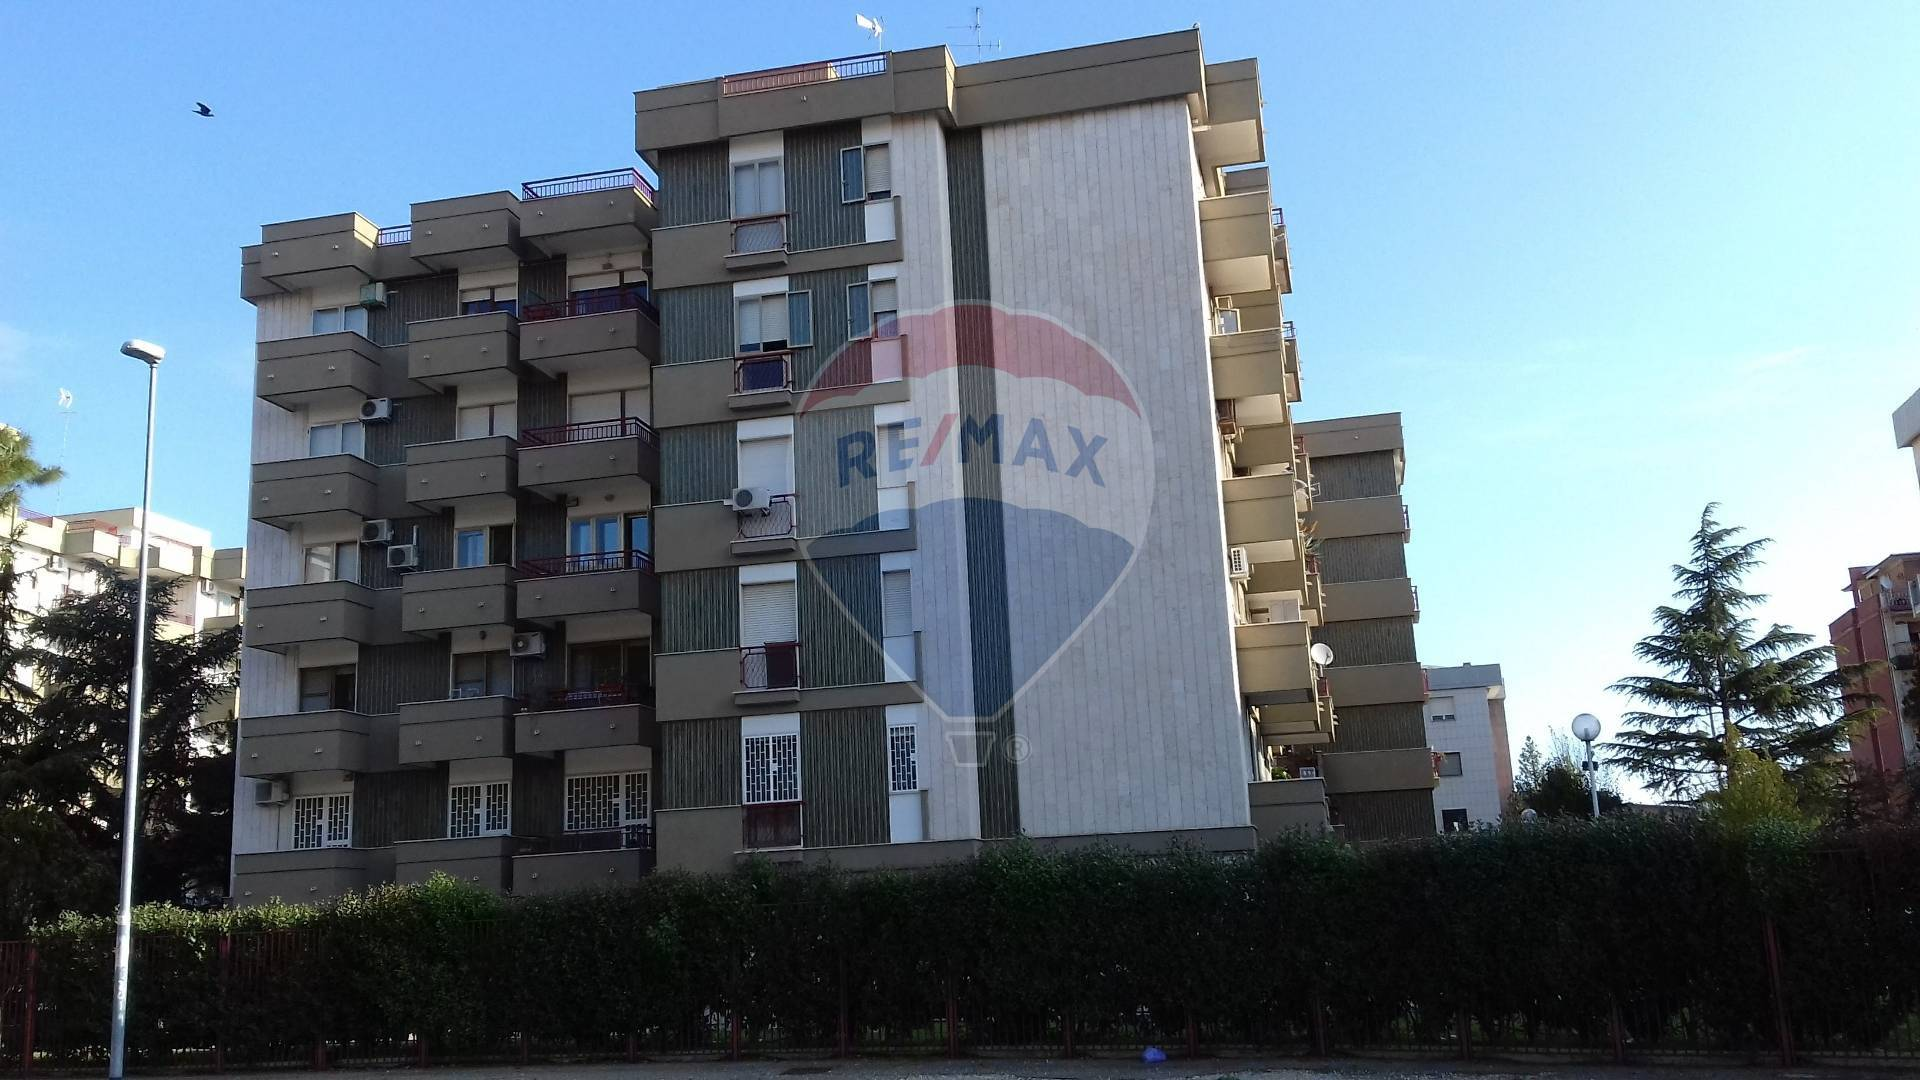 foggia vendita quart: foggia-stadio san ciro san michele re-max-capitan-house